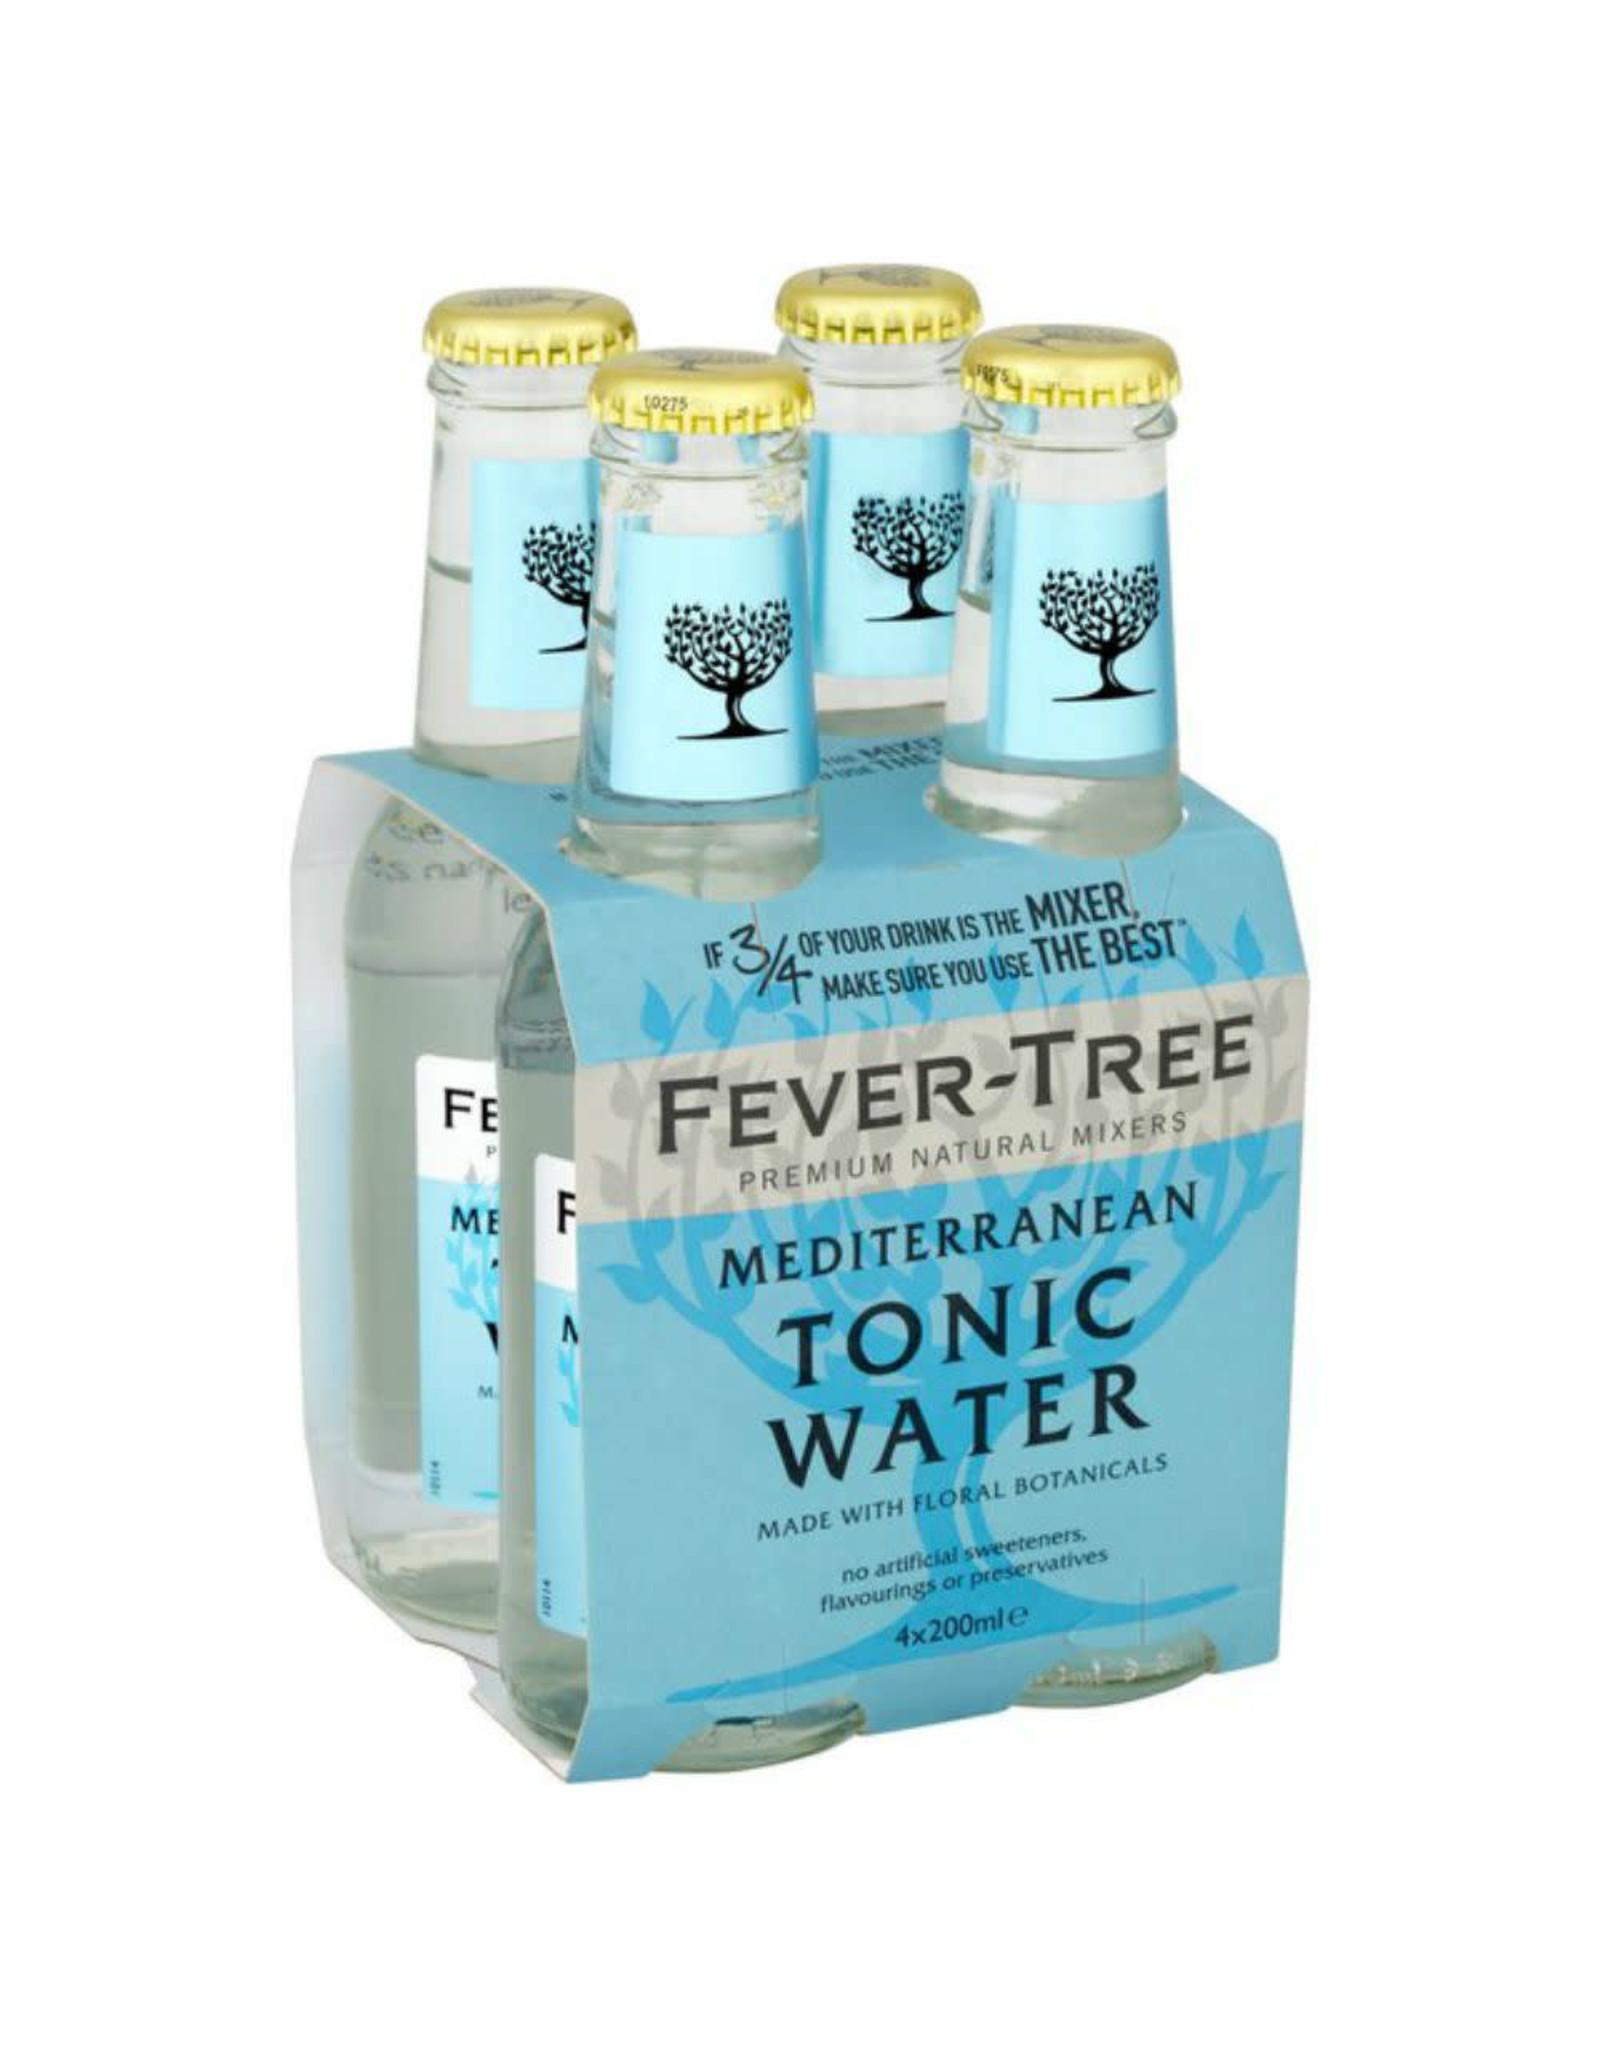 Fever-Tree Fever-Tree Mediterranean Tonic